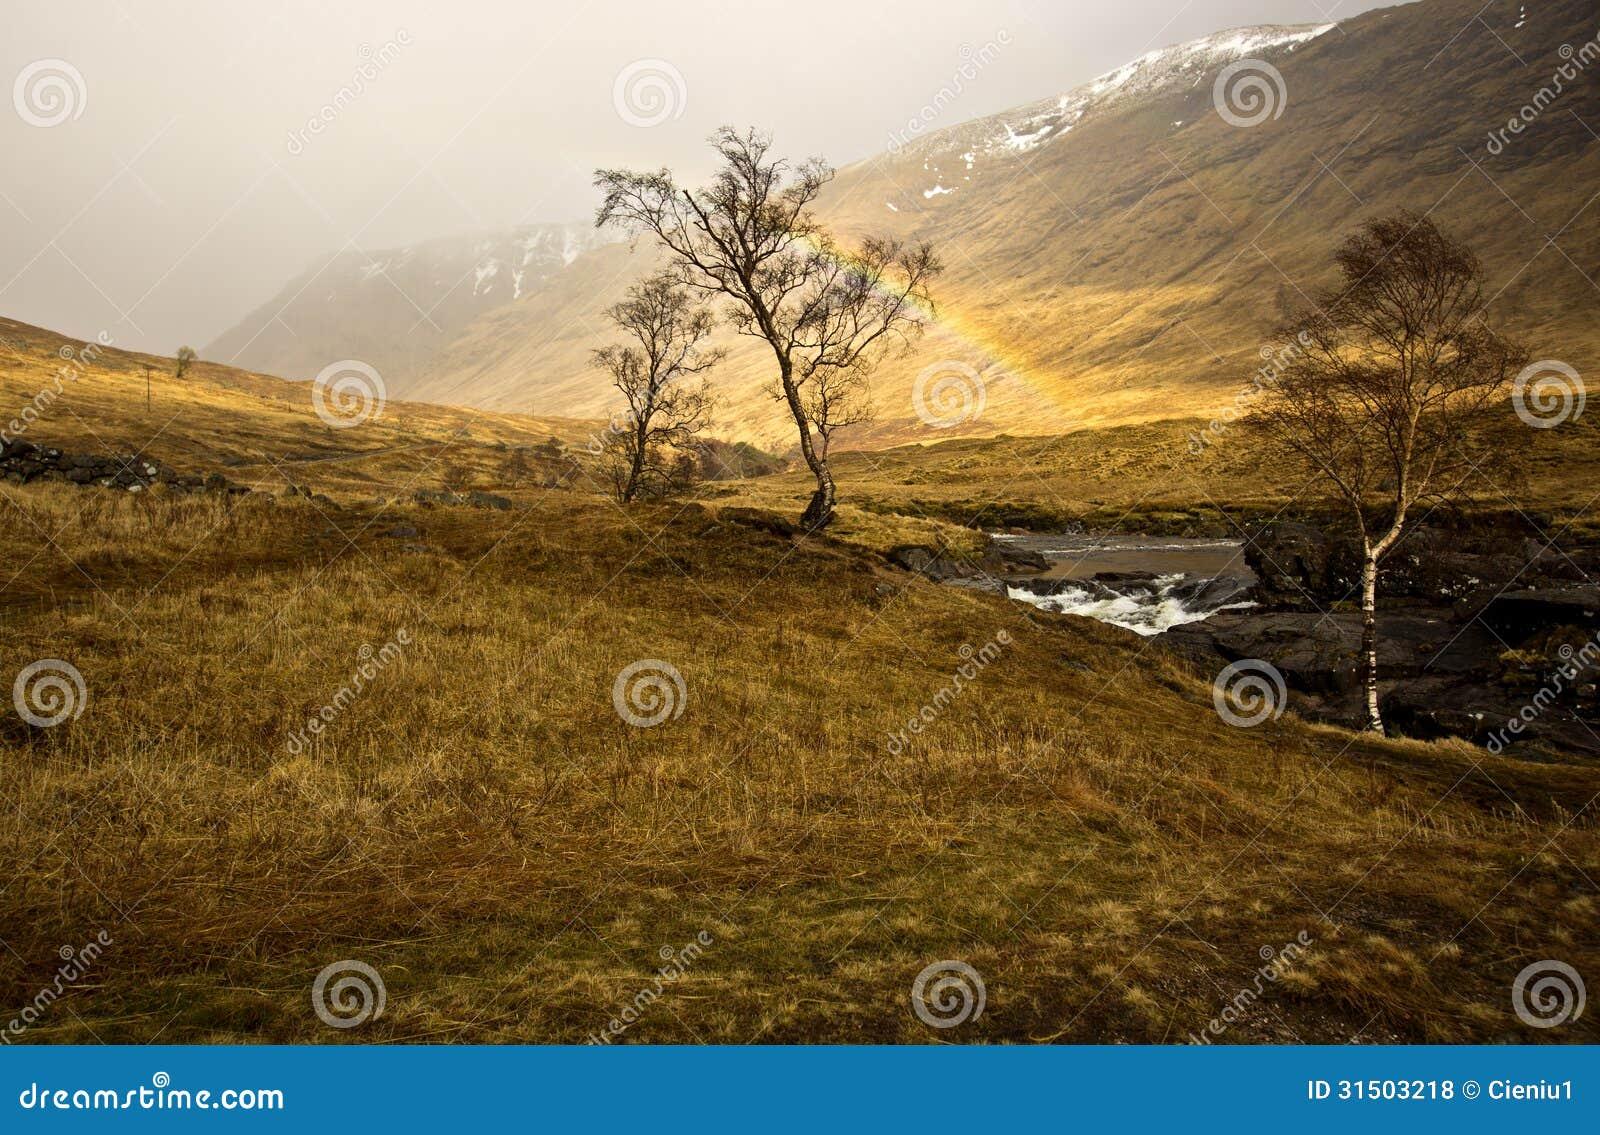 Download Scottish Highlands Rainbow stock photo. Image of river - 31503218